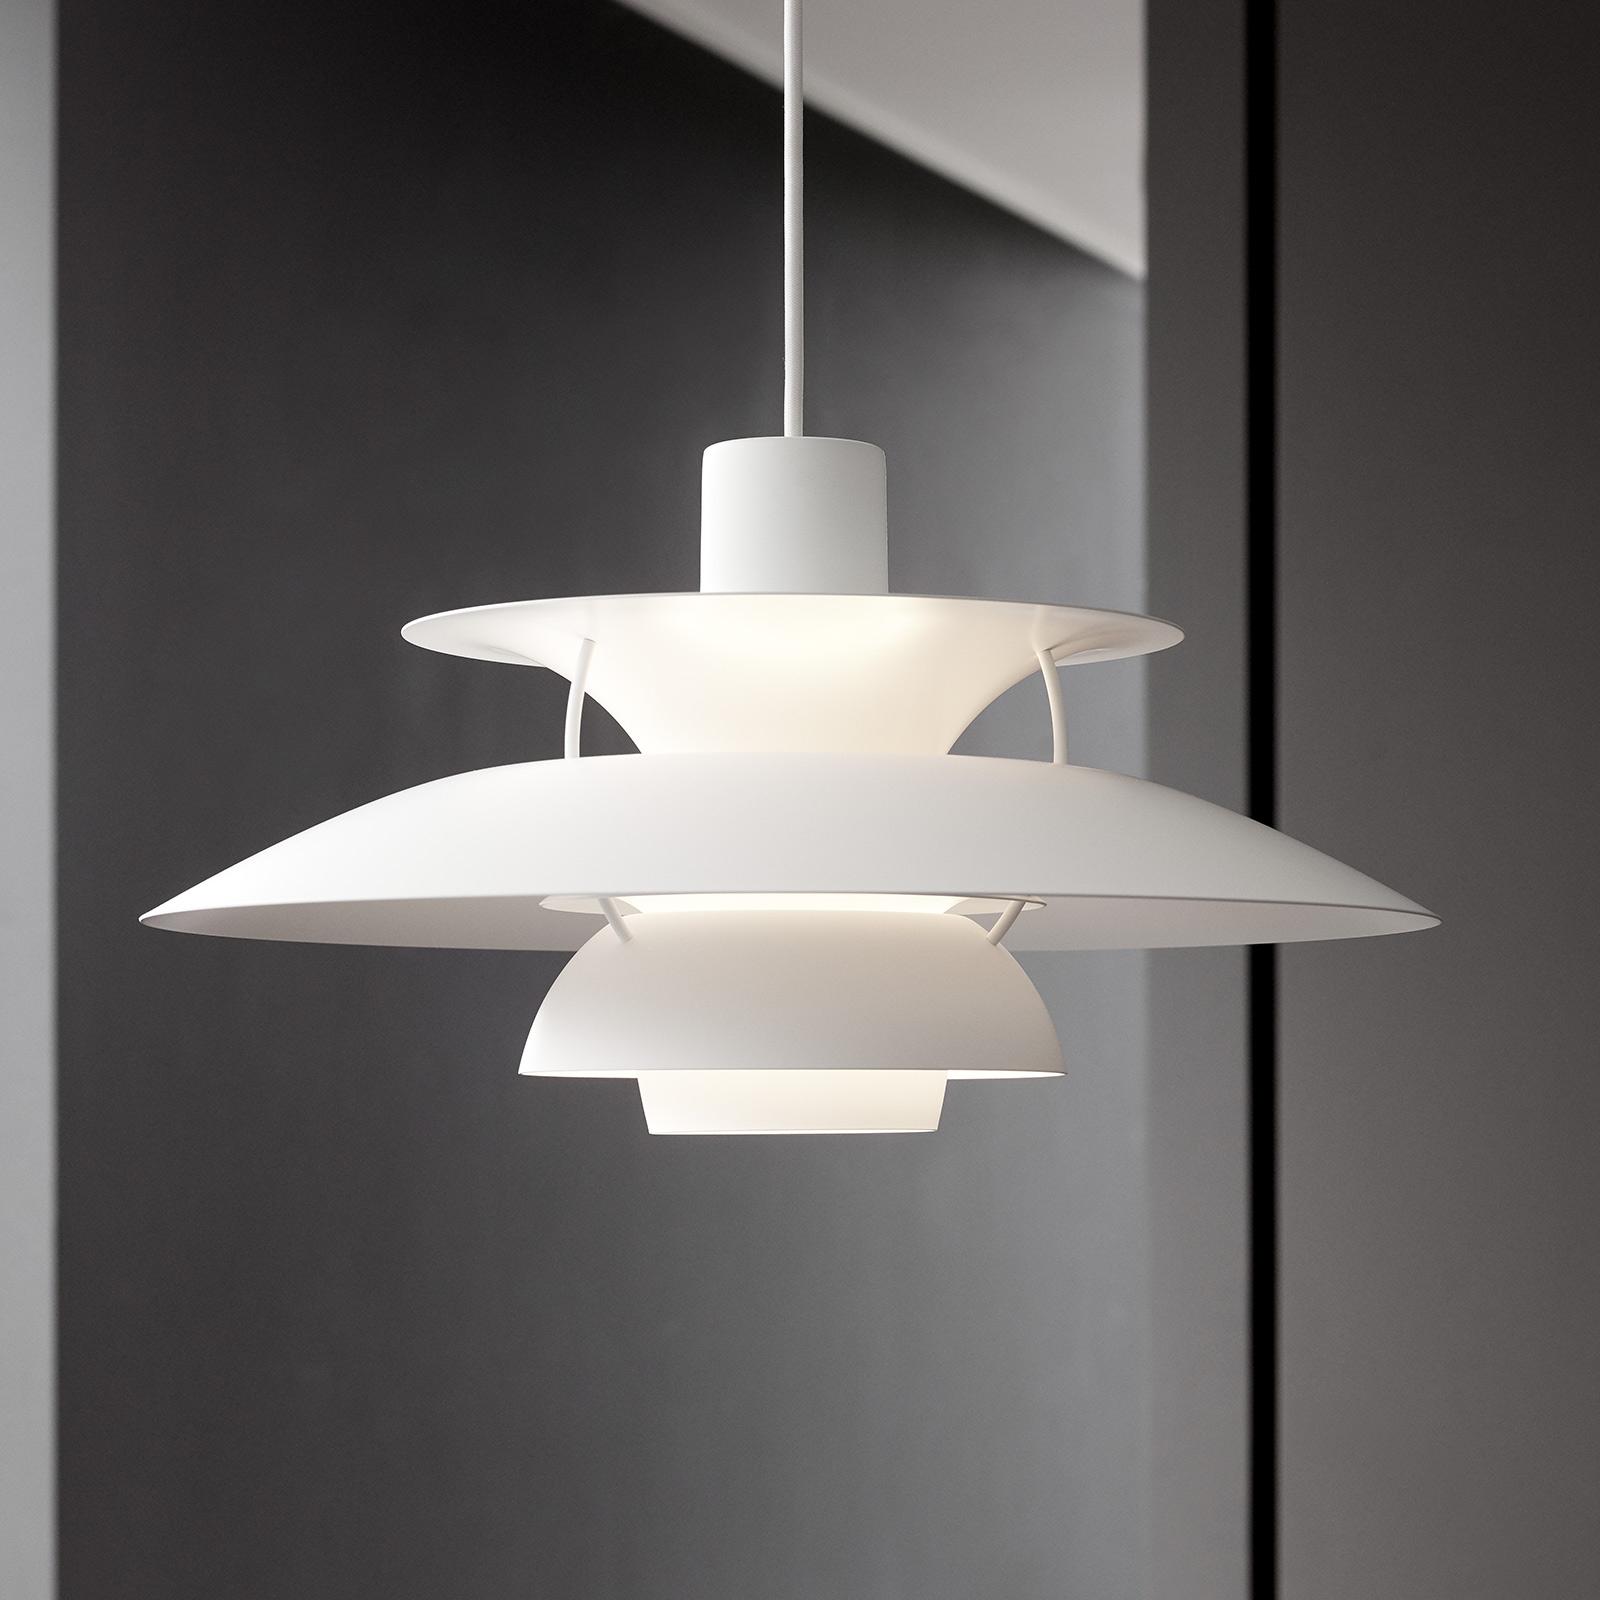 Louis Poulsen PH 5 hanglamp monochroom wit